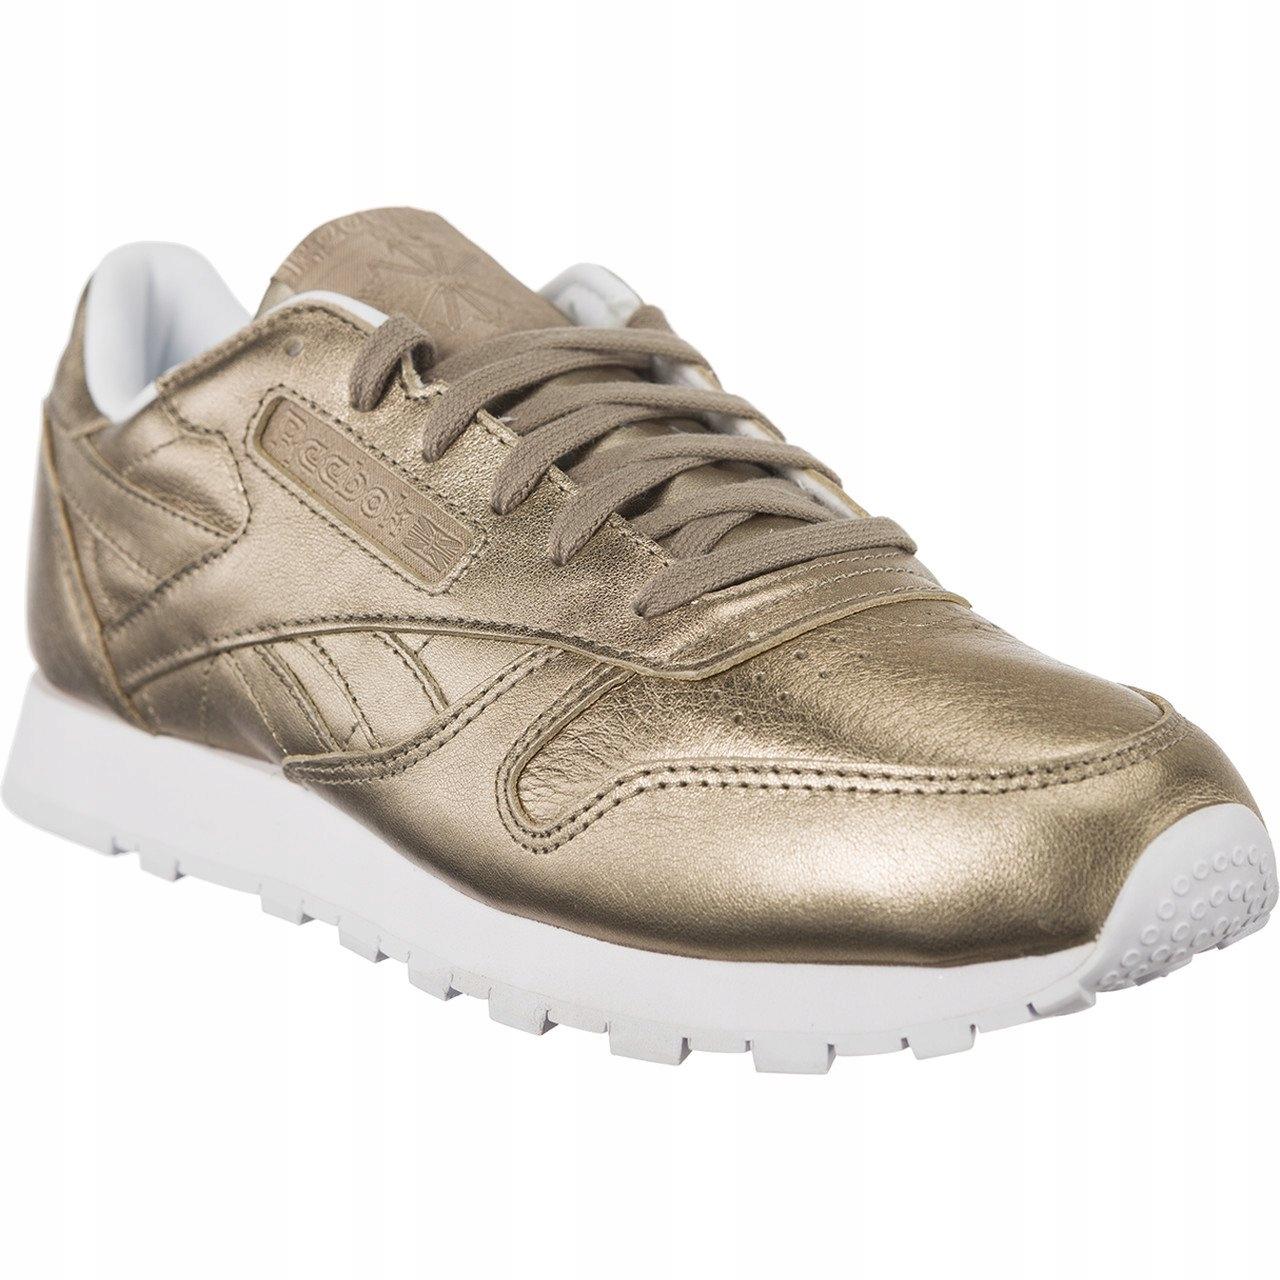 REEBOK CL LTHR L 898 (40,5) Damskie Sneakersy